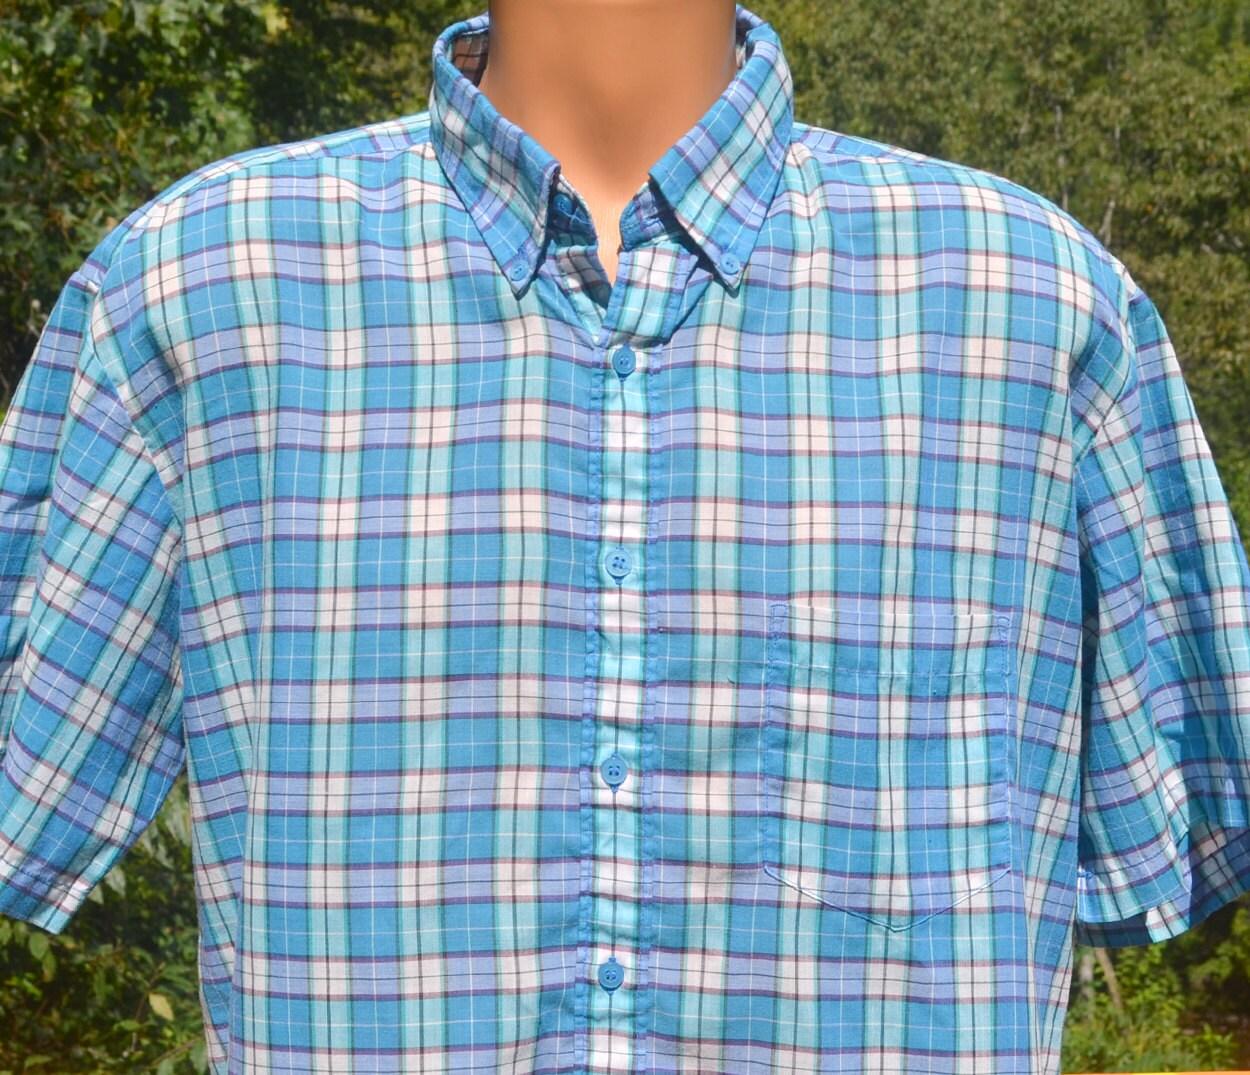 80s Tops, Shirts, T-shirts, Blouse   90s T-shirts Vintage 80S Shirt Plaid Short Sleeve Button Down Teal Large Xl Soft Thin $20.50 AT vintagedancer.com